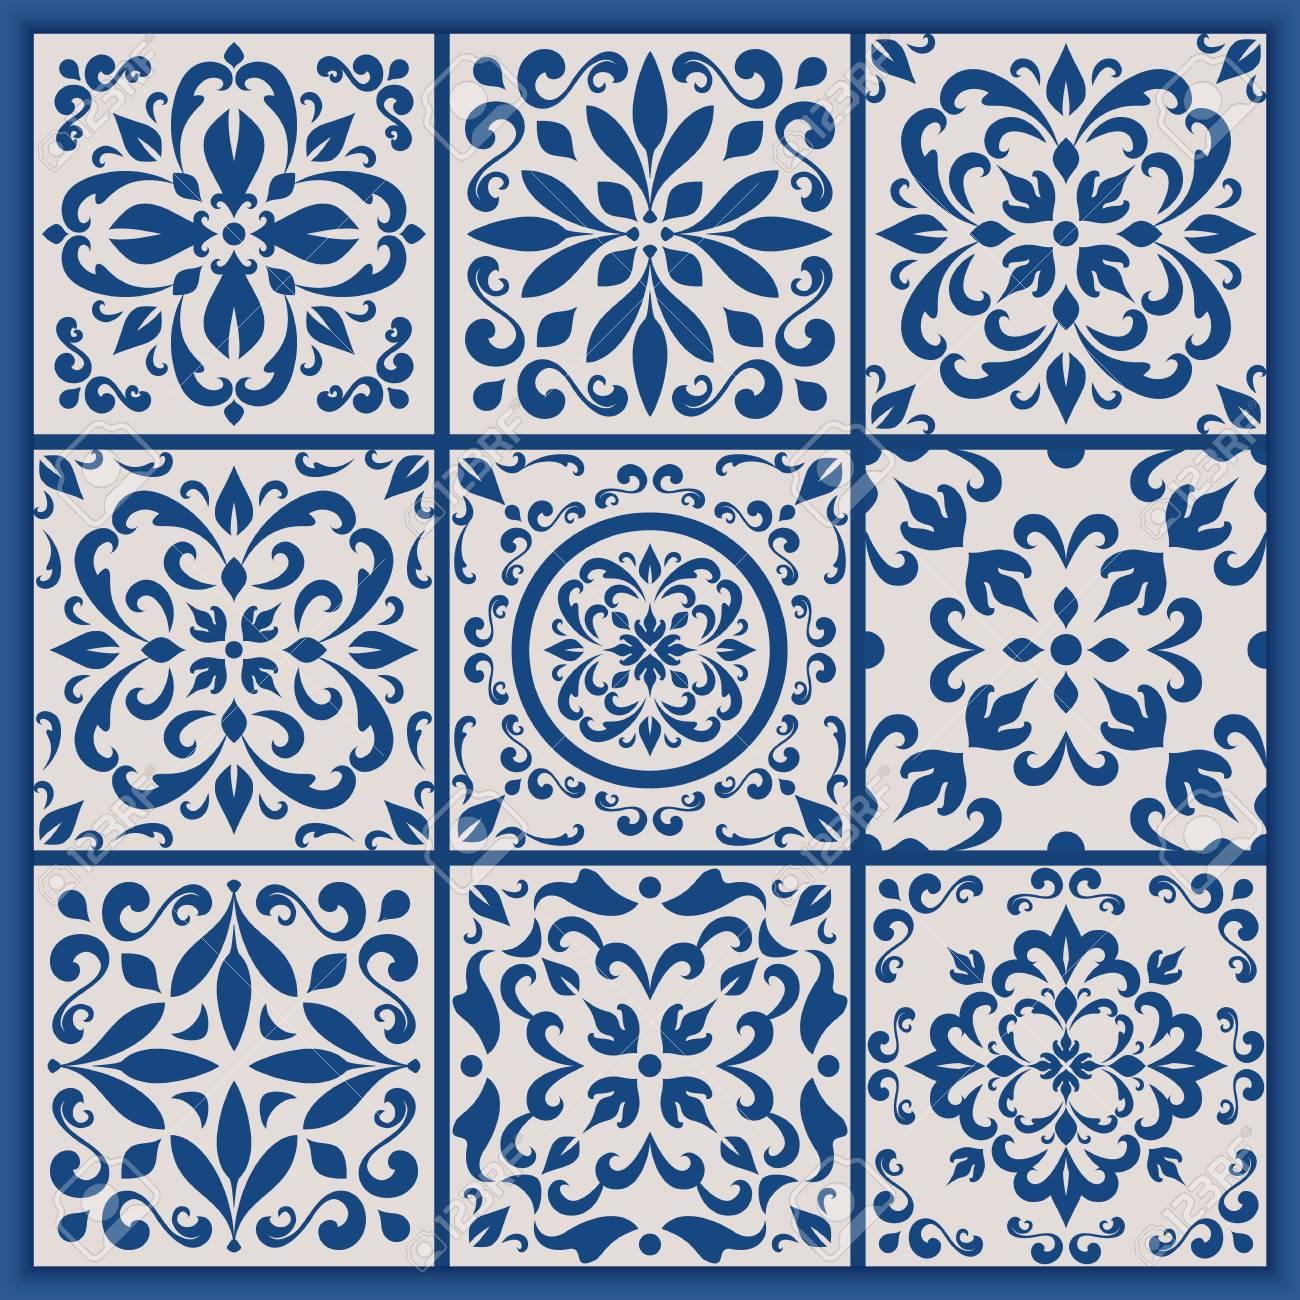 Blue and white ornate Portuguese tiles. Vector azulejo patterns. Simple mandala ornaments. Set of ornamental ceramic tiles in Lisbon style. Decorative maiolica design. - 86617890